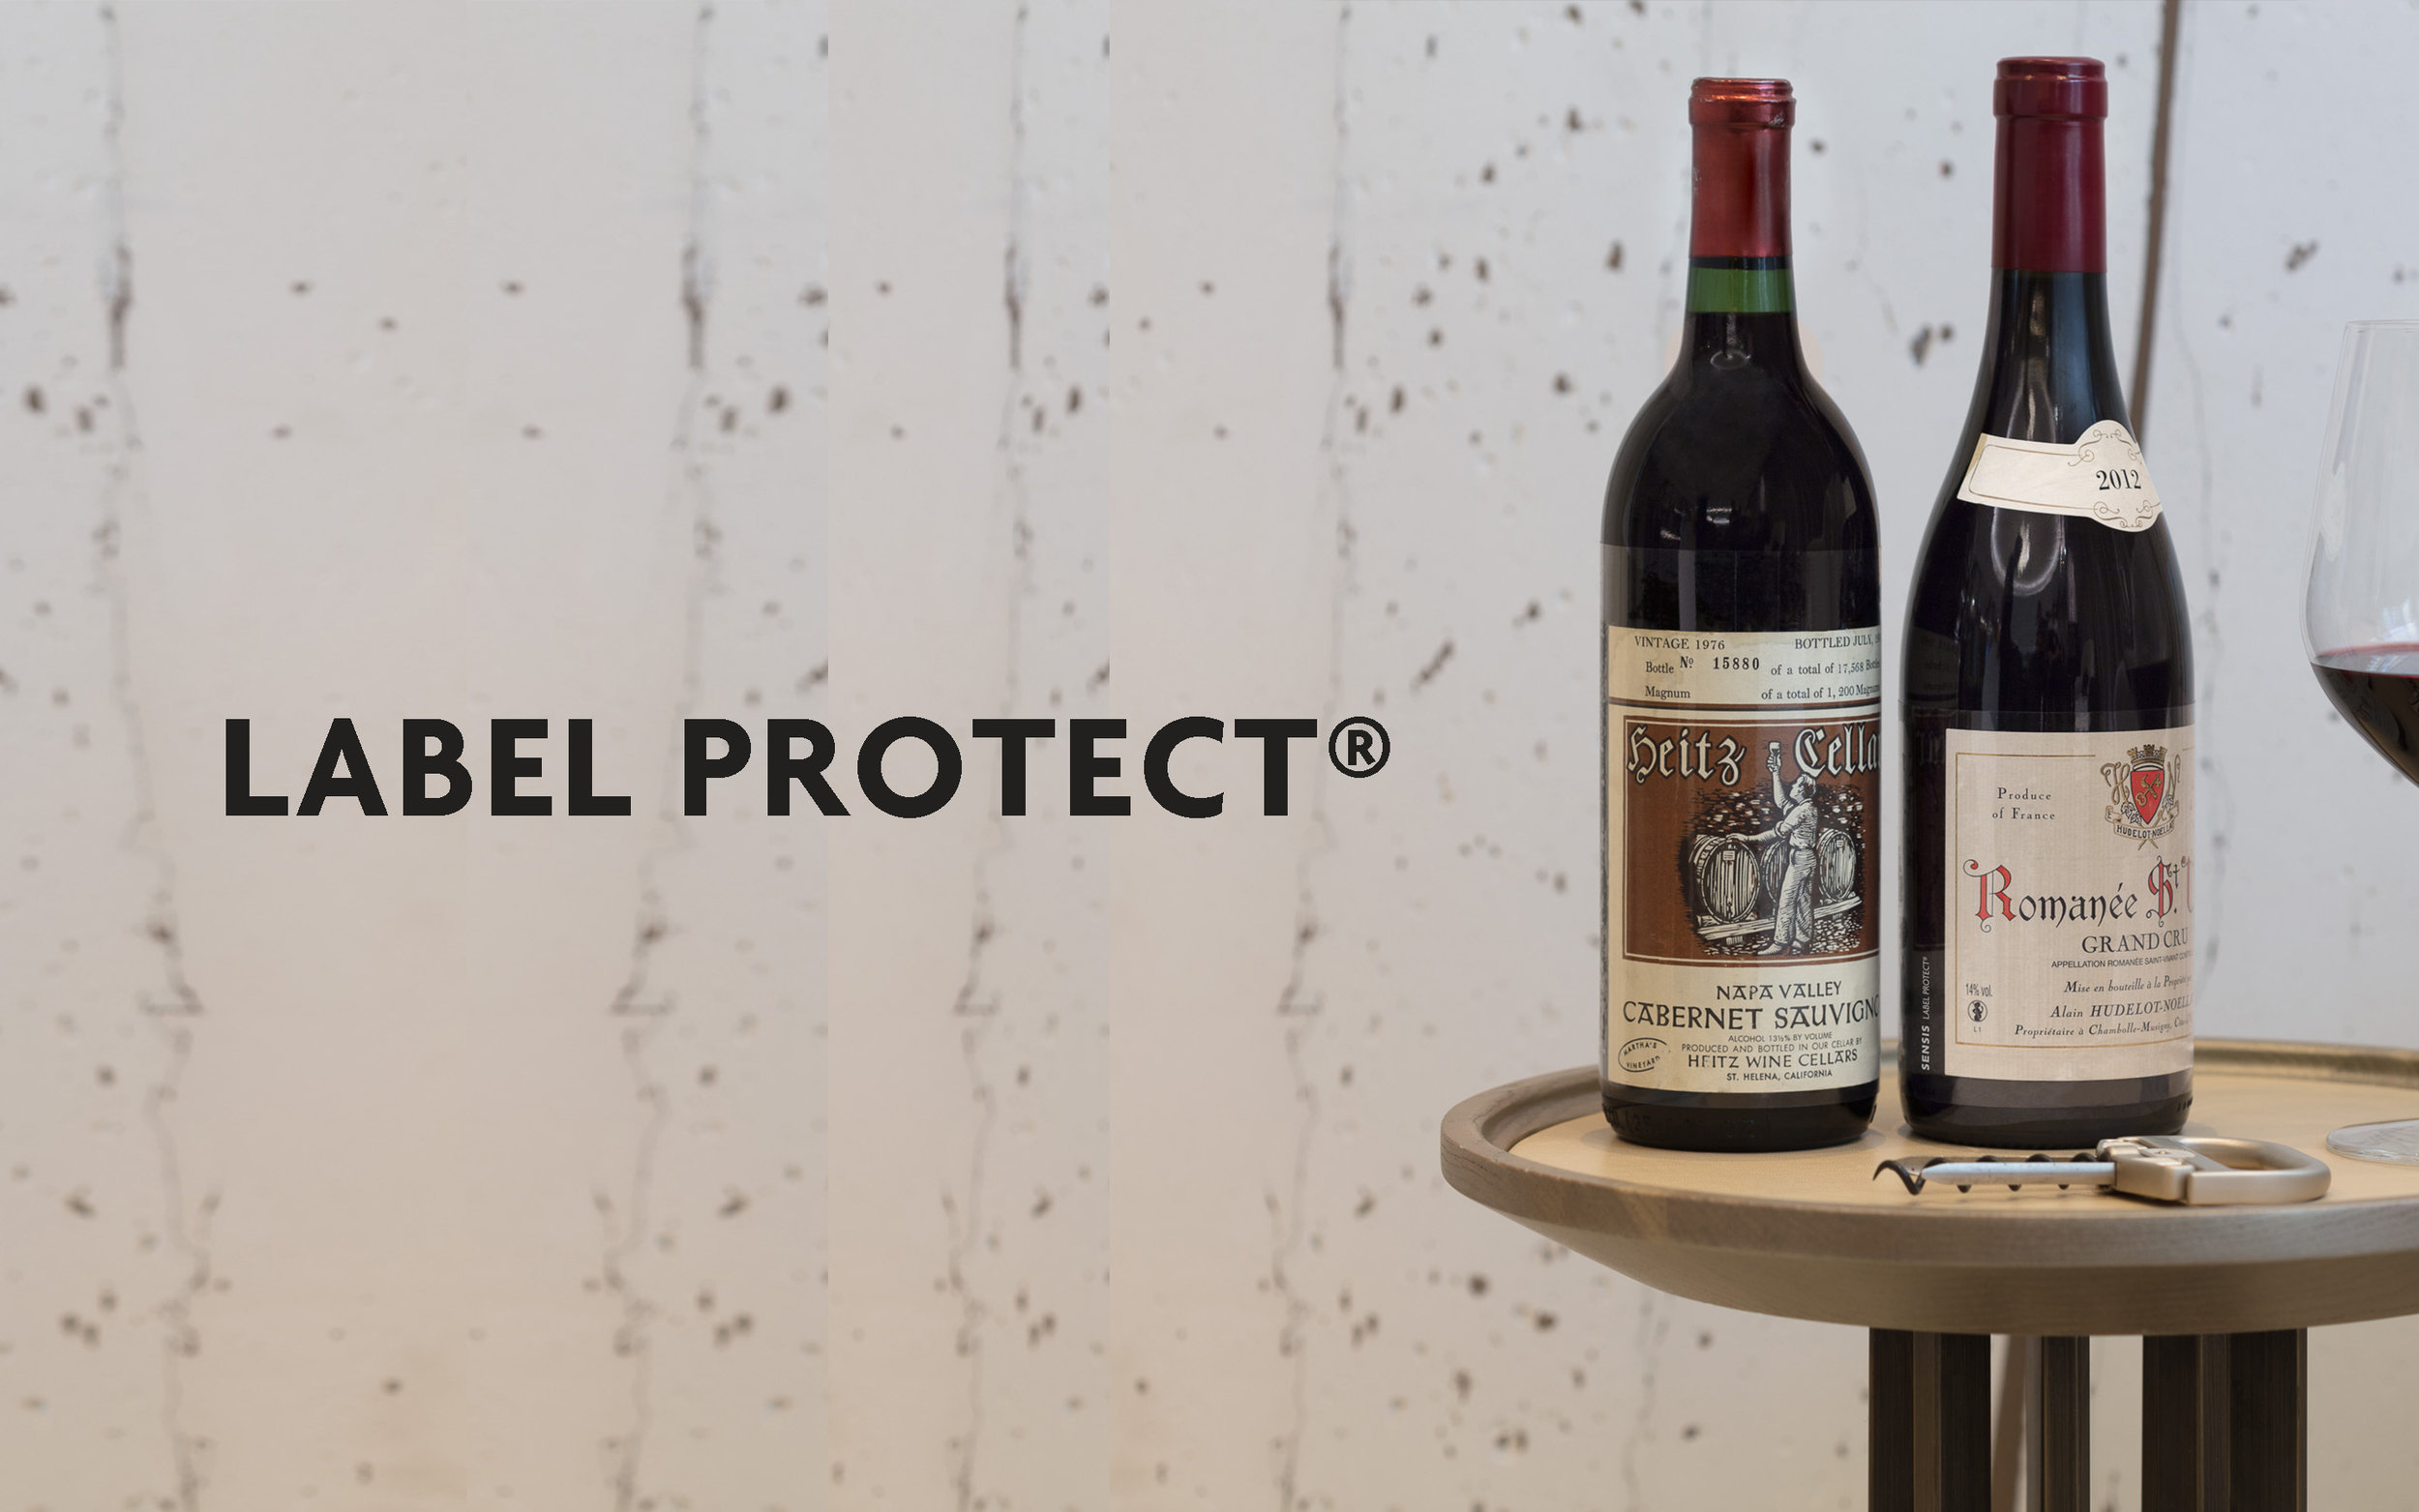 LABEL_PROTECT_SENSIS_HONGKONG_WINECELLAR